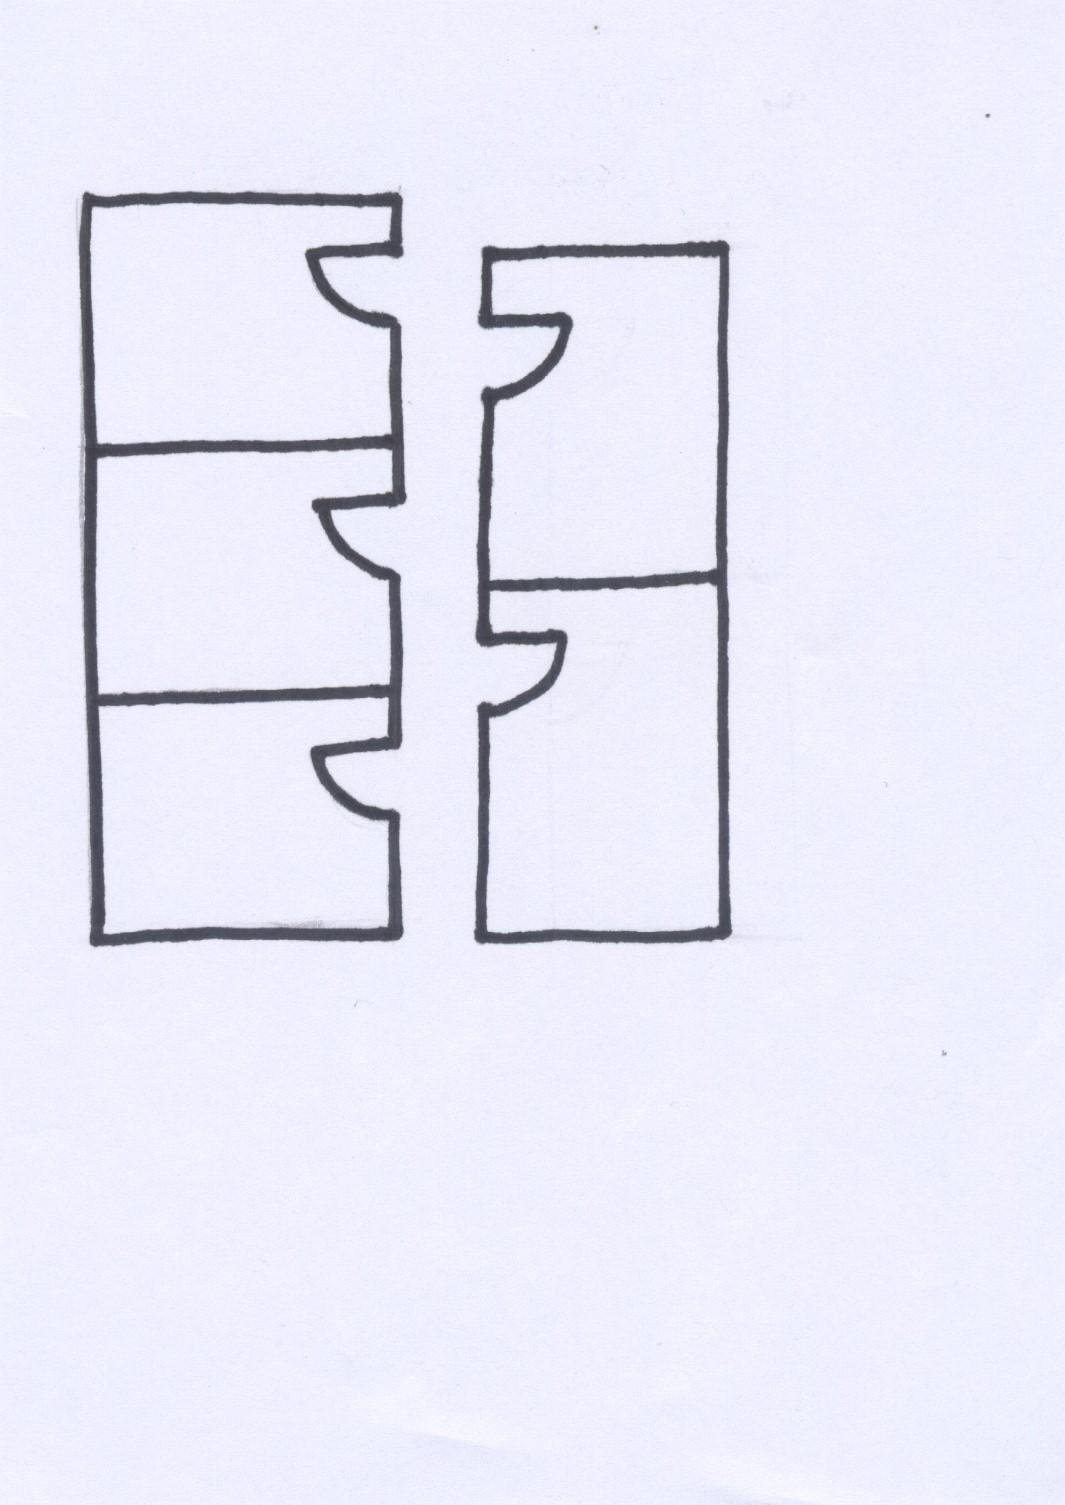 W18-3